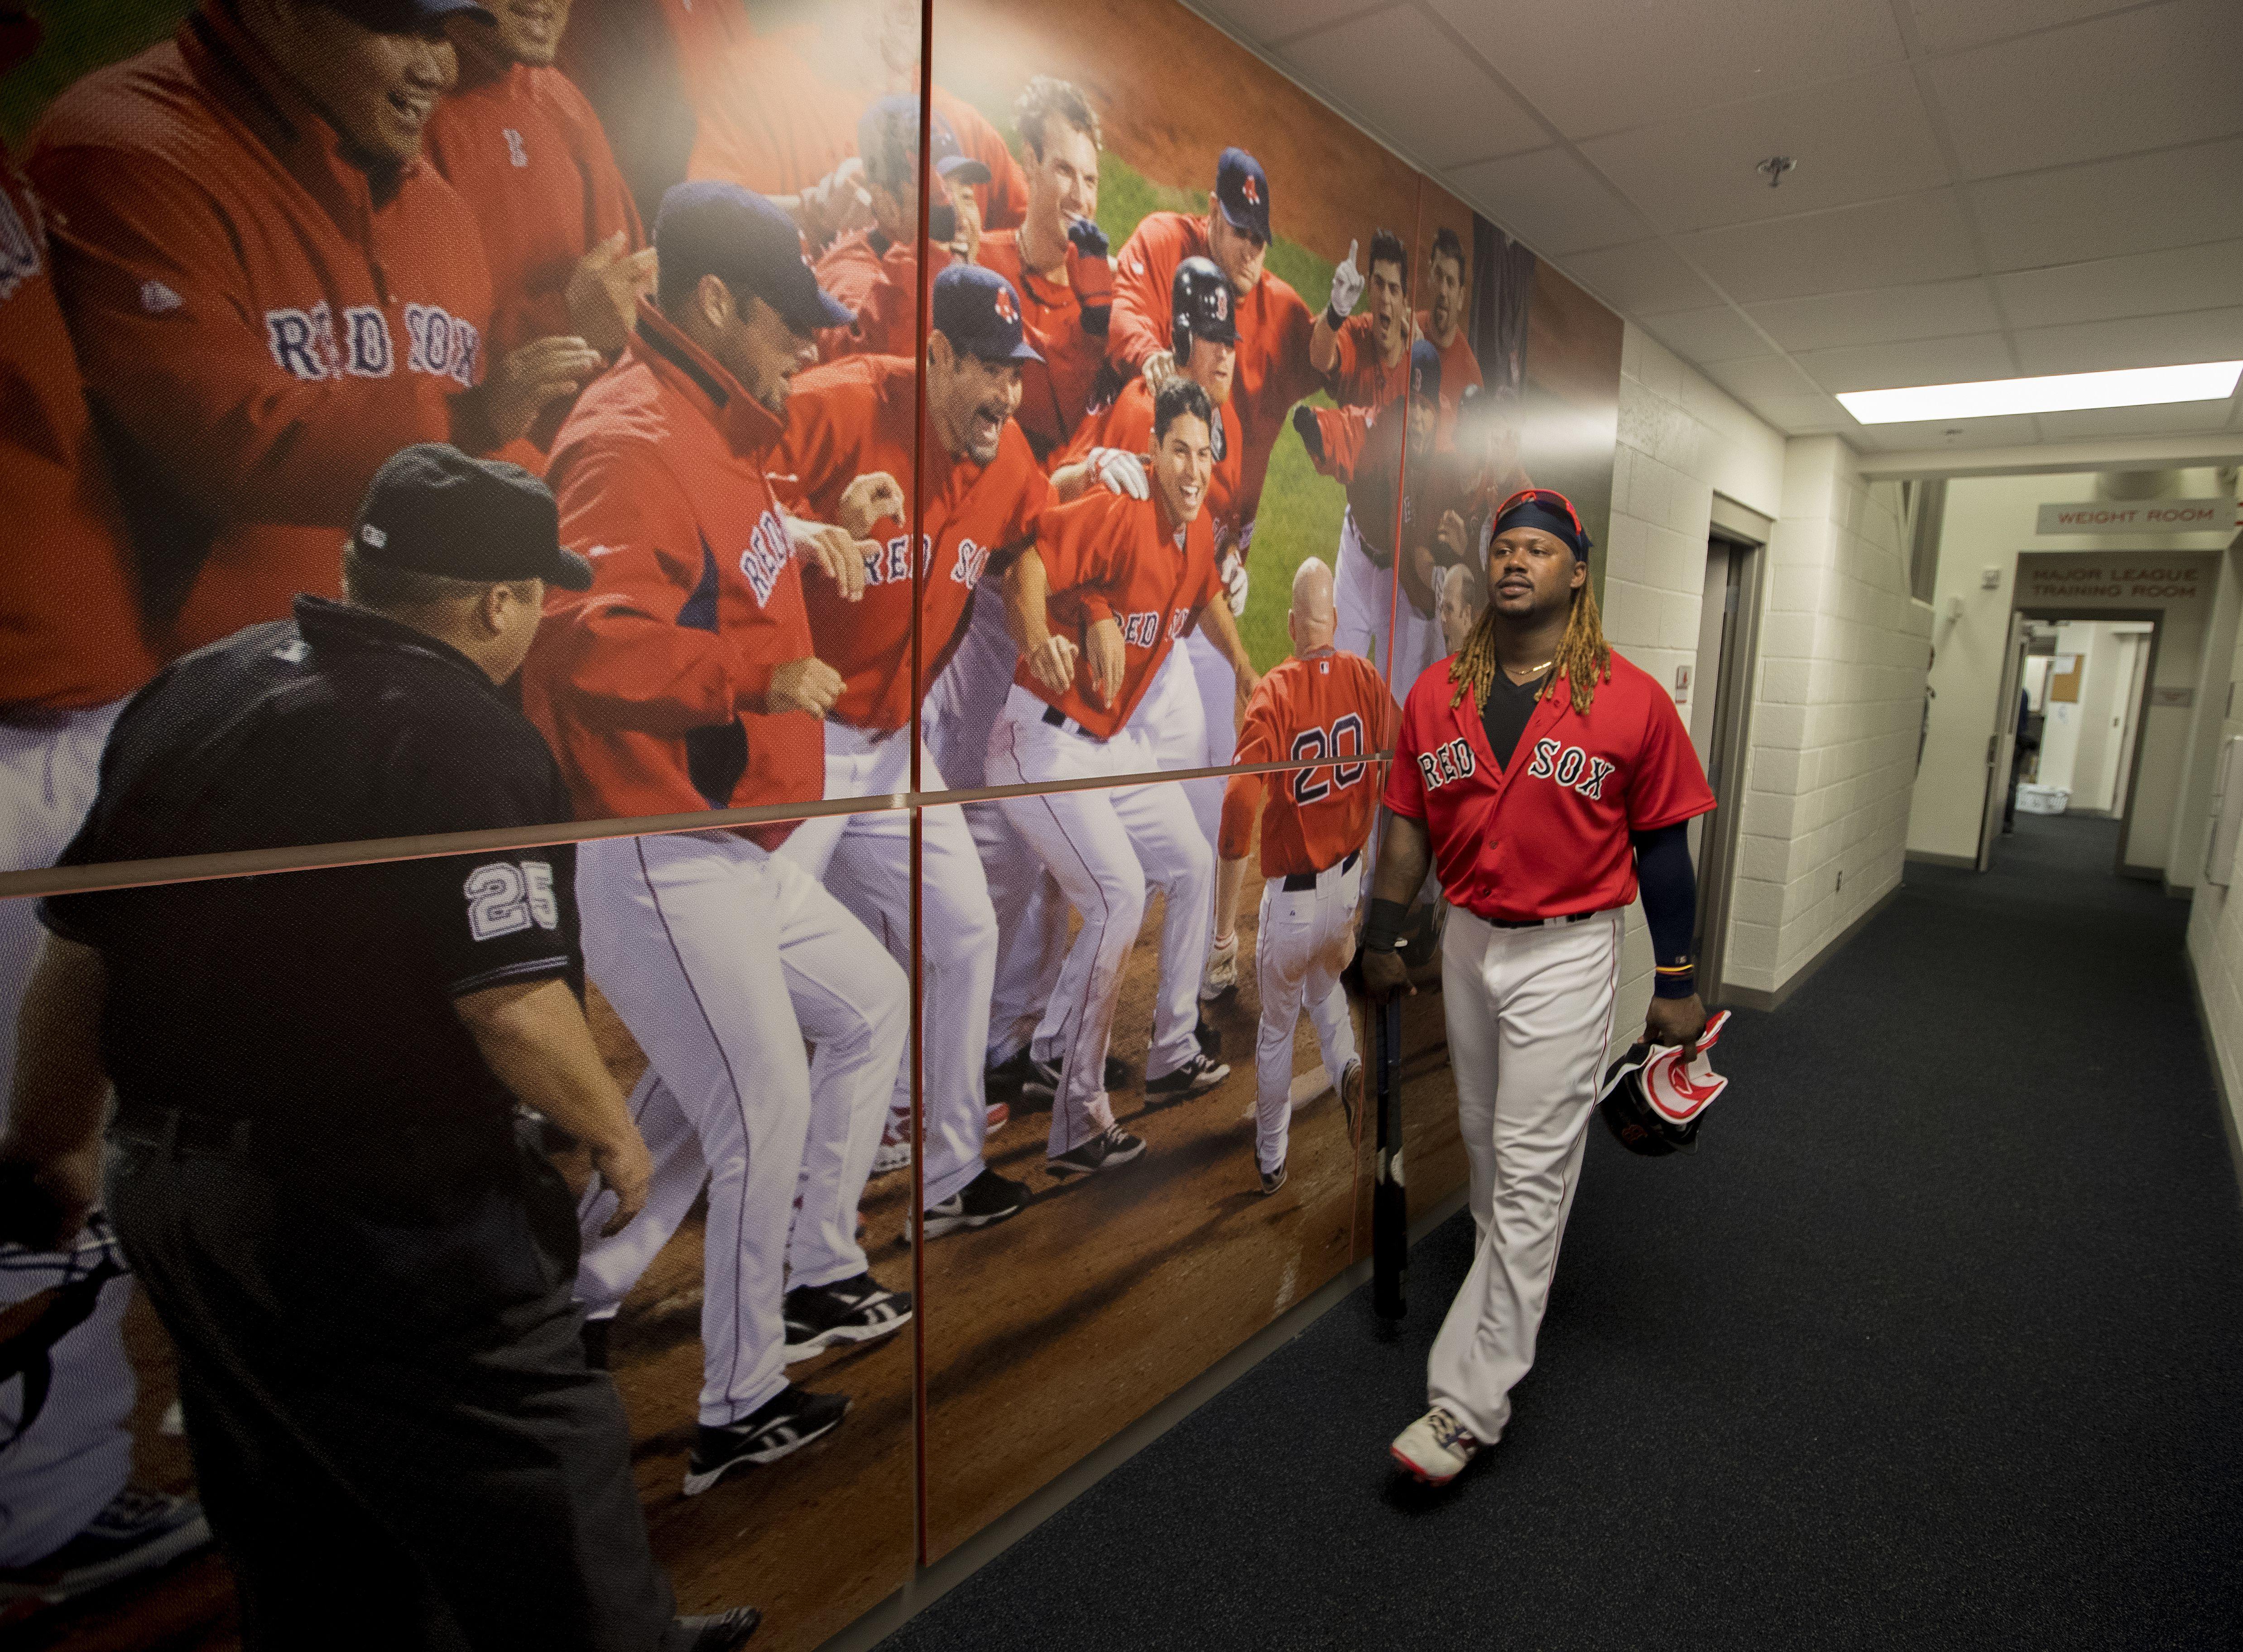 9a7773c29 Hanley Ramirez shifts into a new gear - The Boston Globe